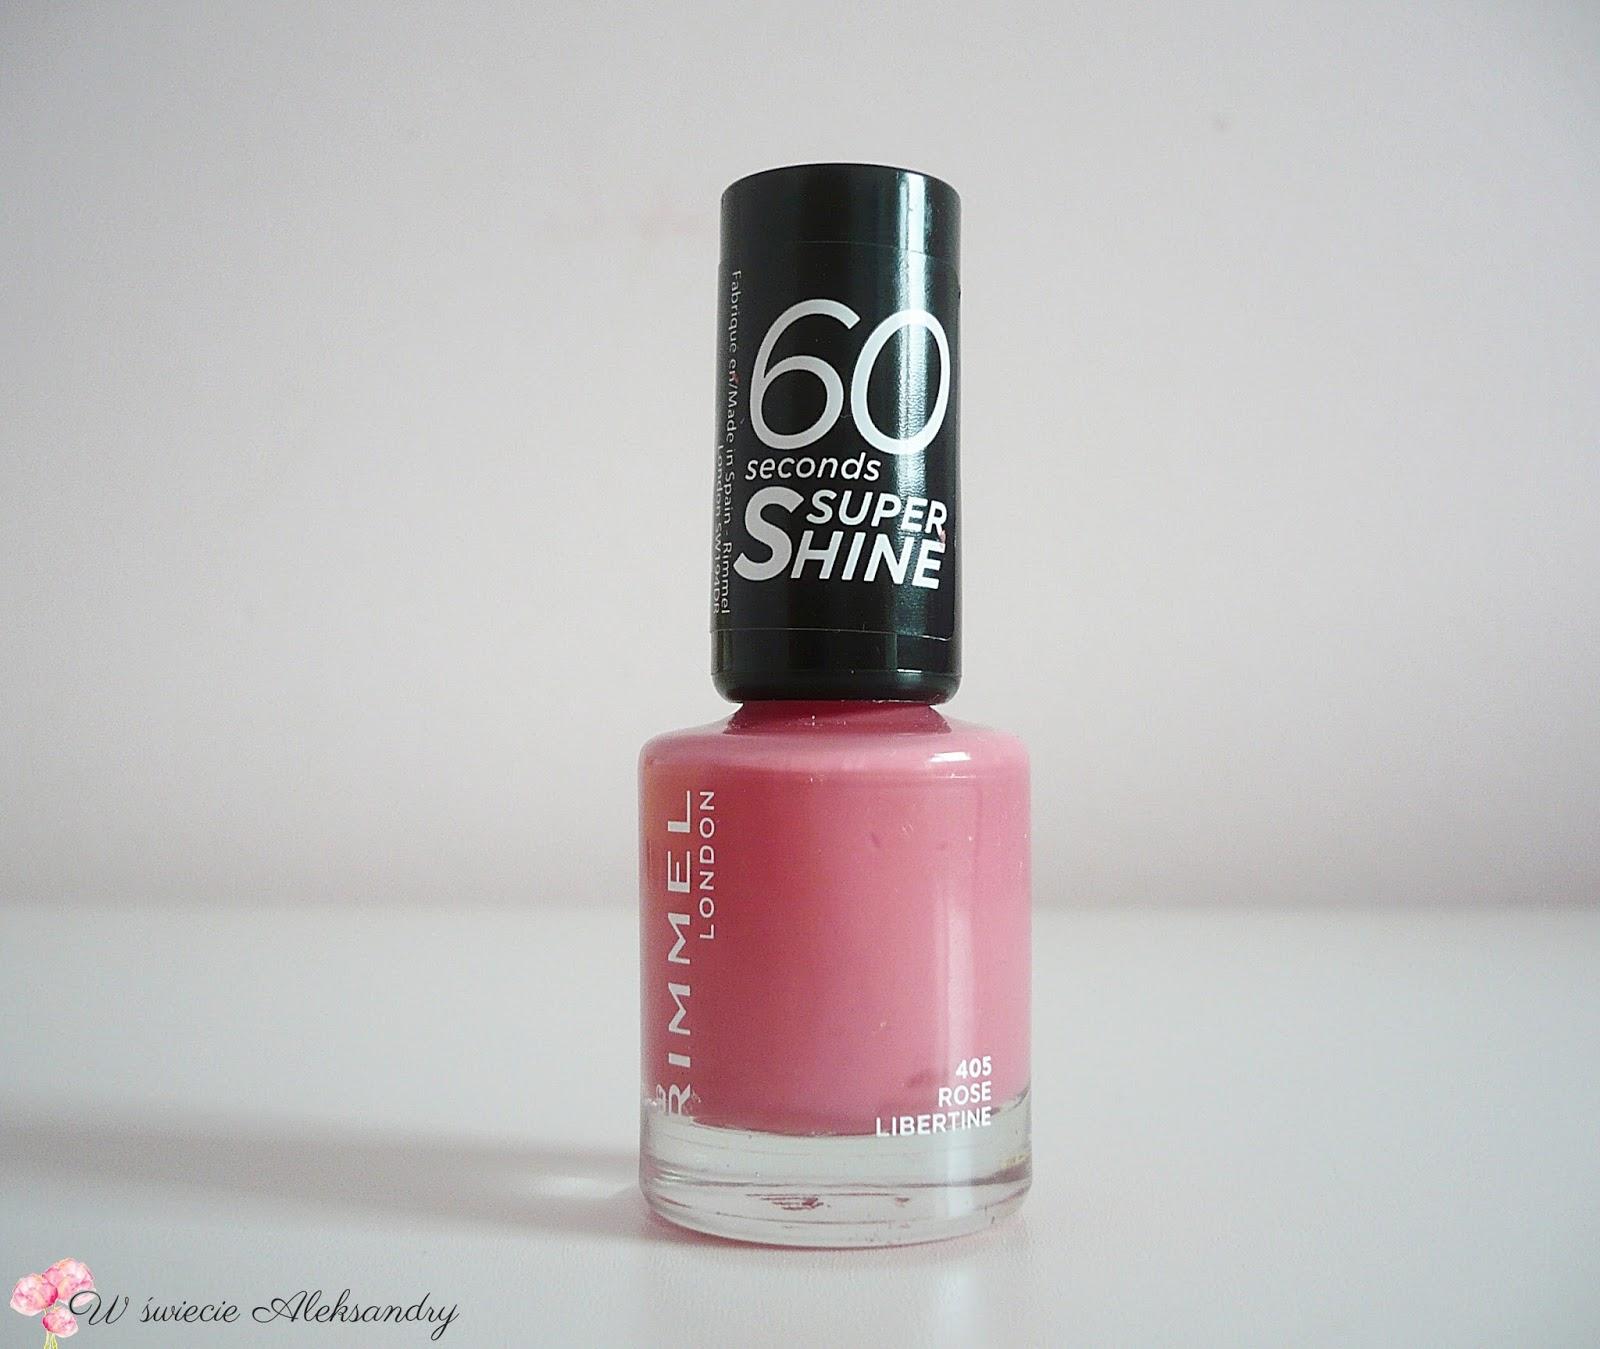 Swiat Aleksandry Rimmel 60 Seconds Super Shine 405